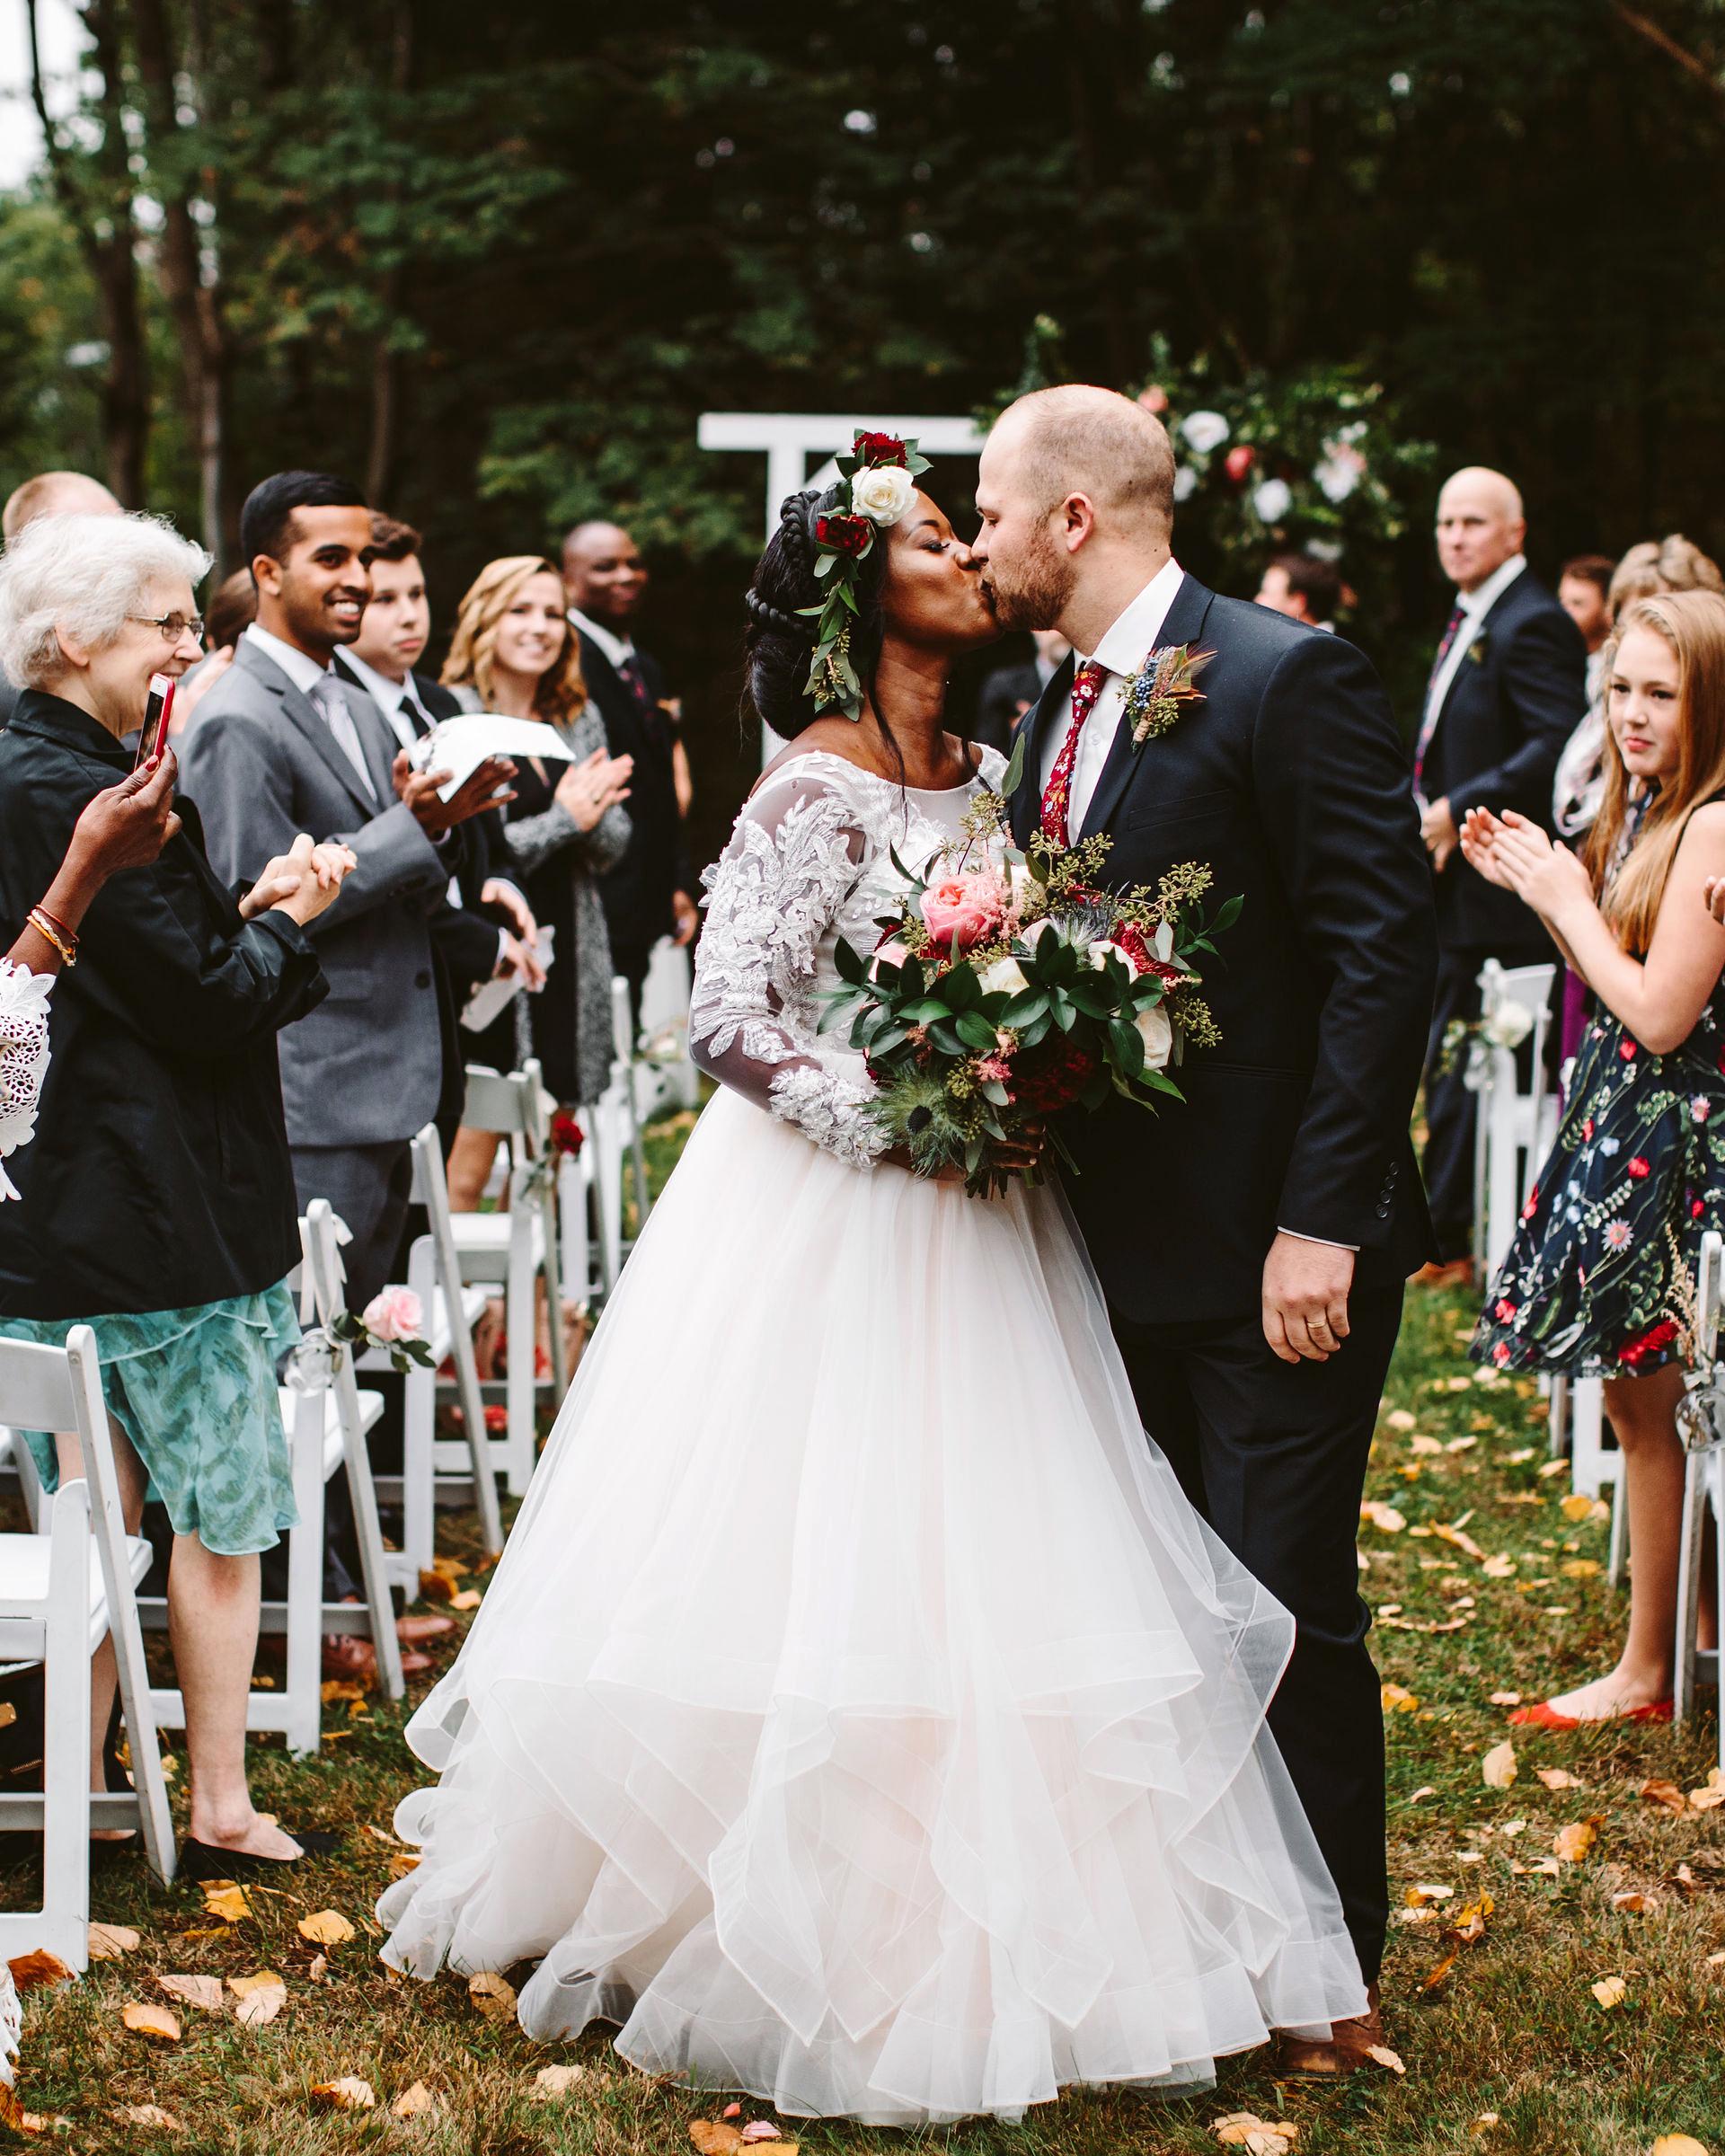 rivka aaron wedding couple bride groom kissing after ceremony